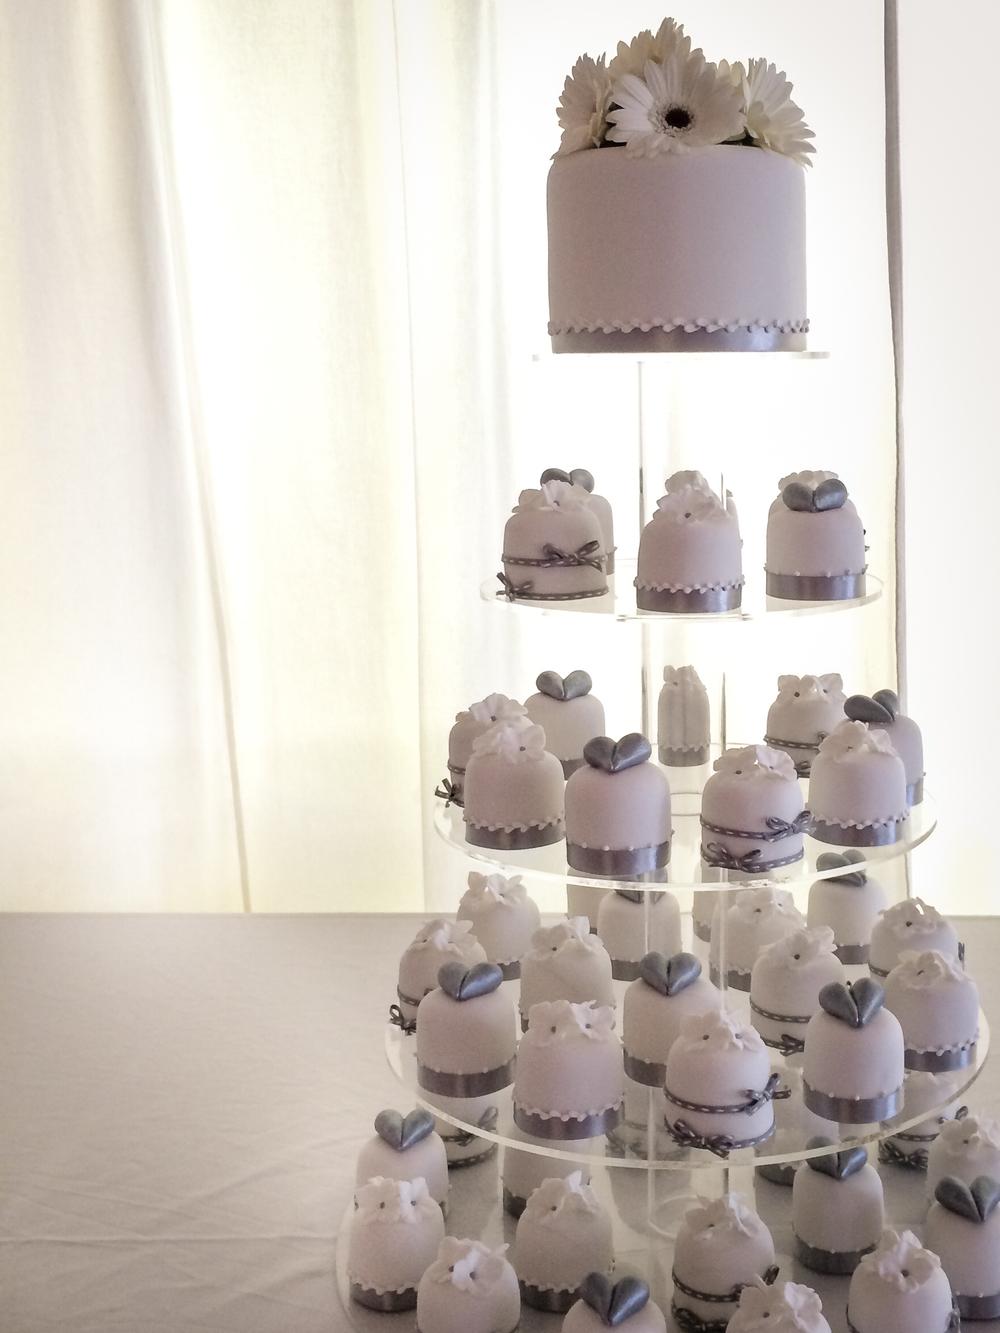 miniature cakes-8.jpg